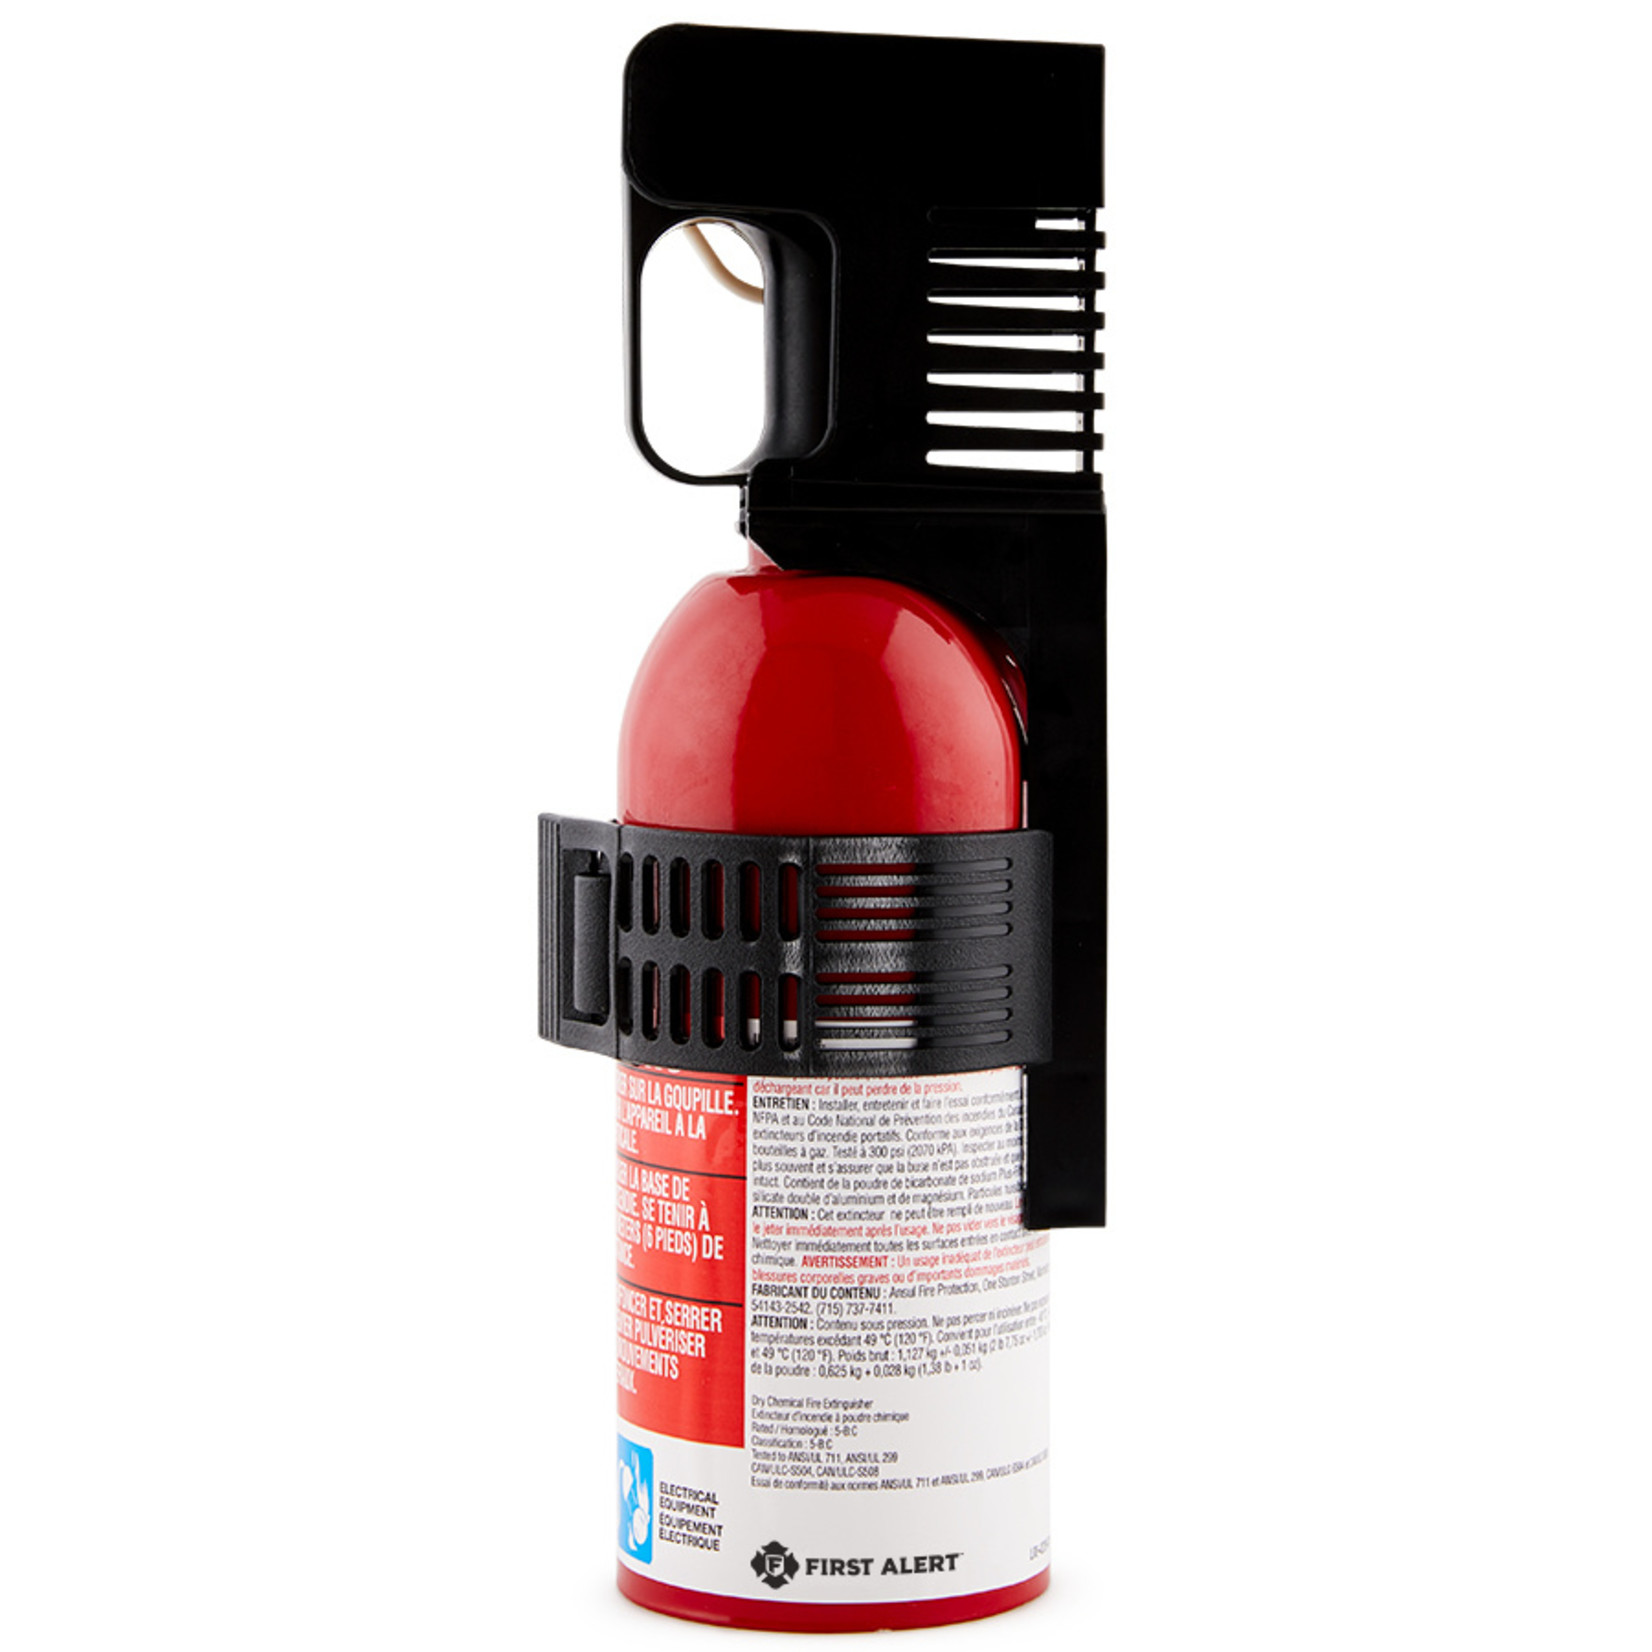 BRK BRK AUTO 5lb Auto Fire Extinguisher